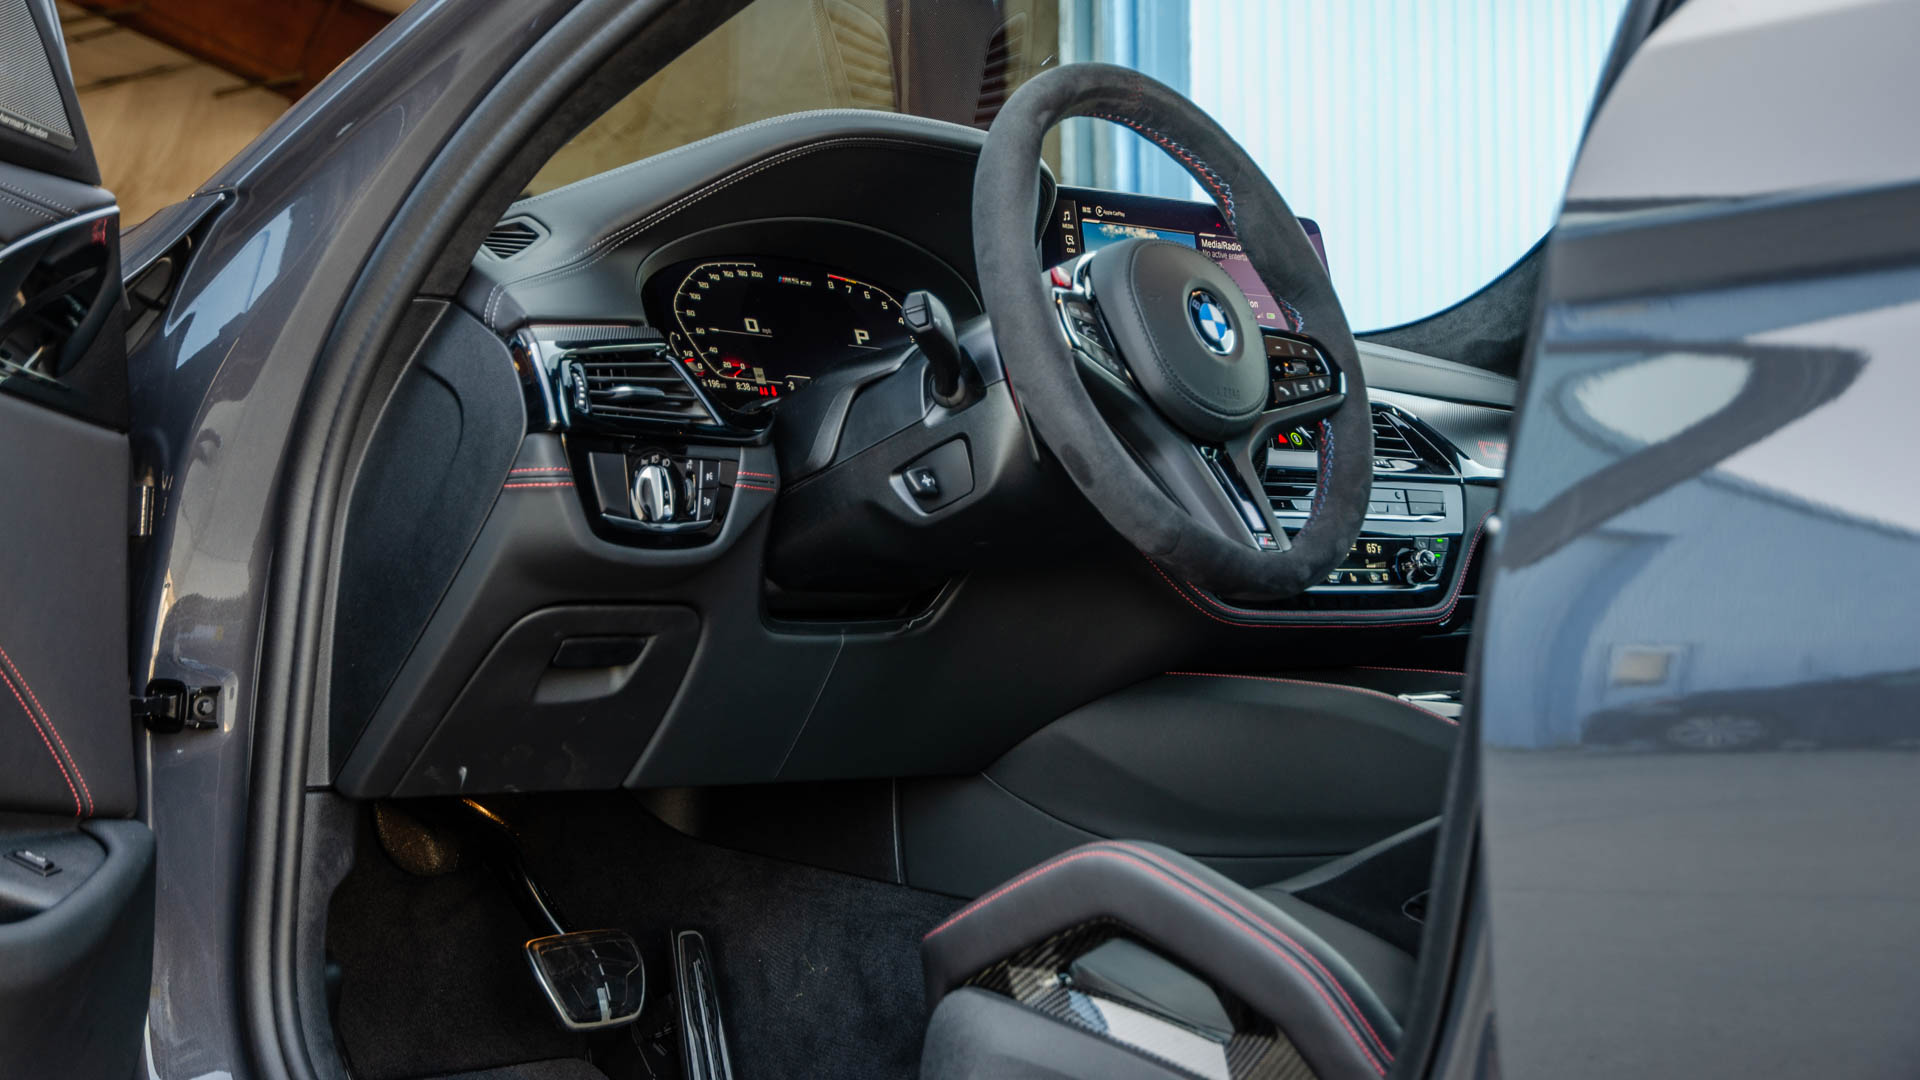 BMW M5 CS Test Drive 15 of 40